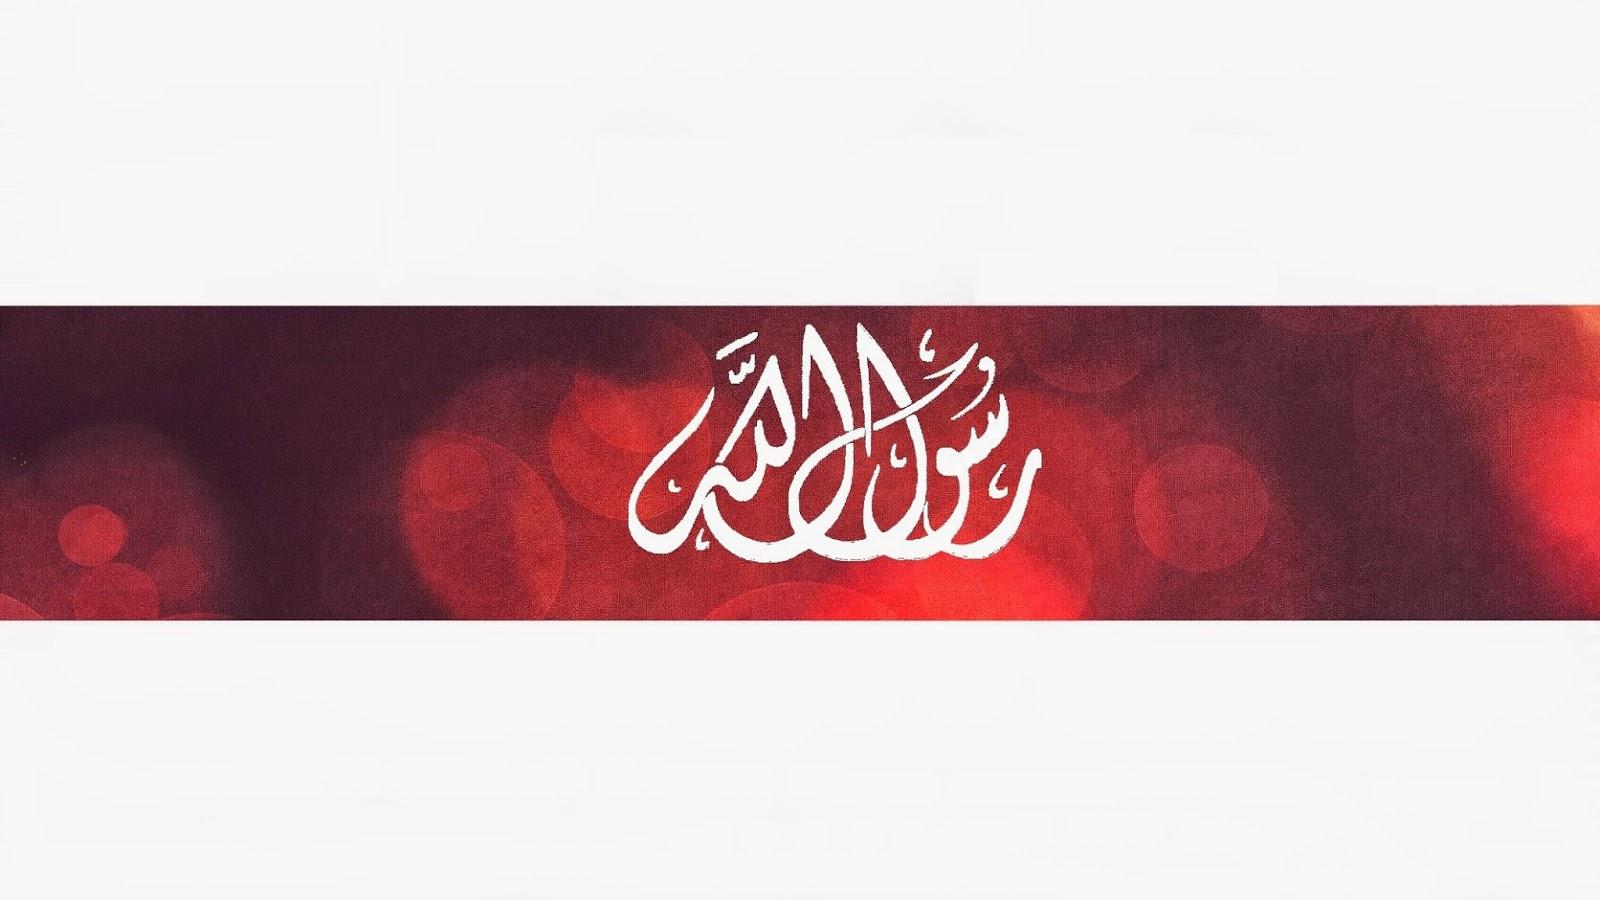 صوره يوتيوب اسلامي , افضل مقطع اسلاميه على يوتيوب